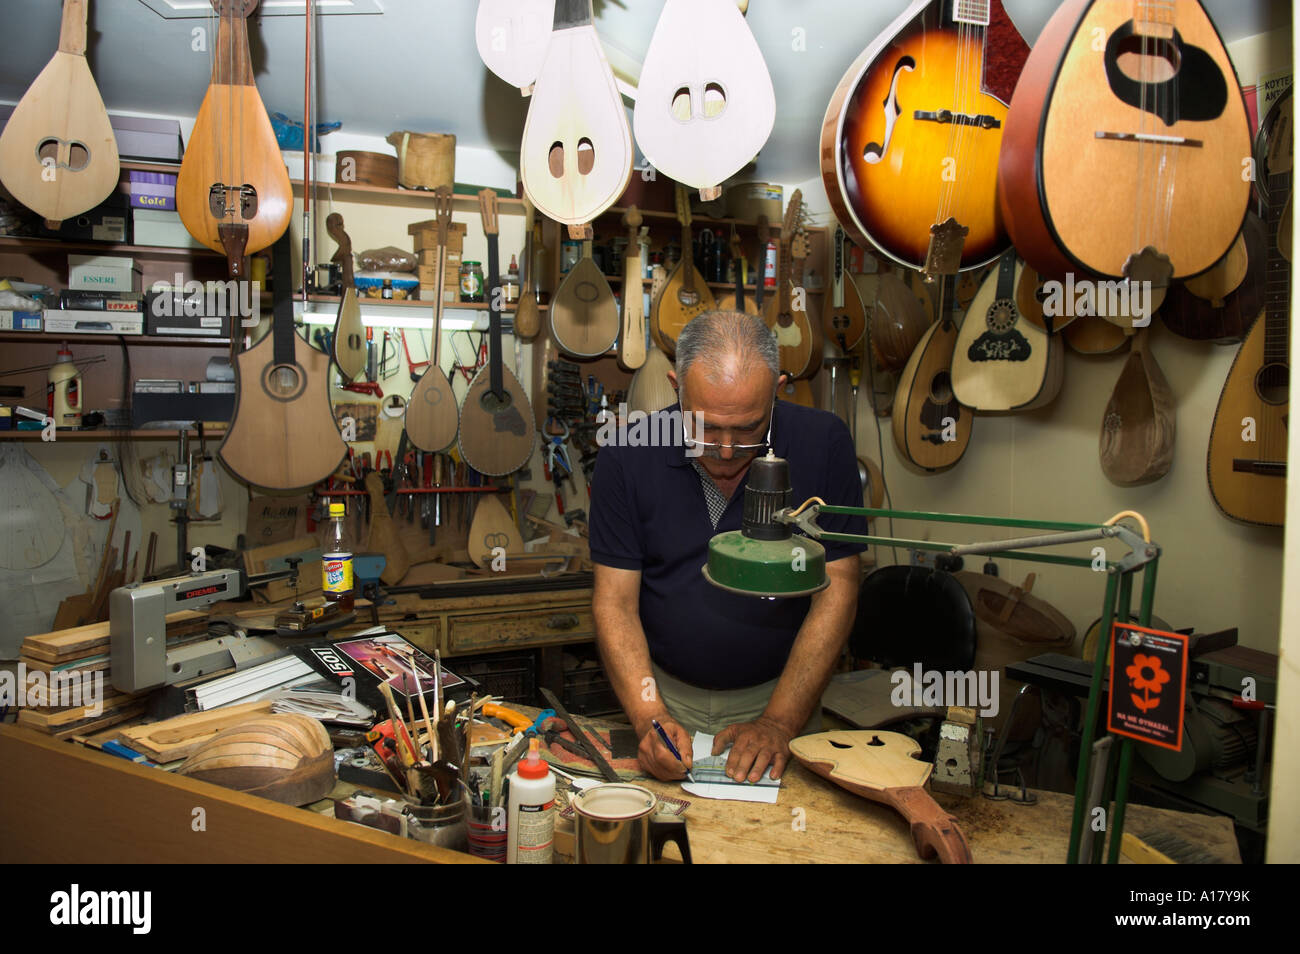 String instrument craftsman maker E Katsantonis in workshop Rethymnon Island of Crete Greece - Stock Image